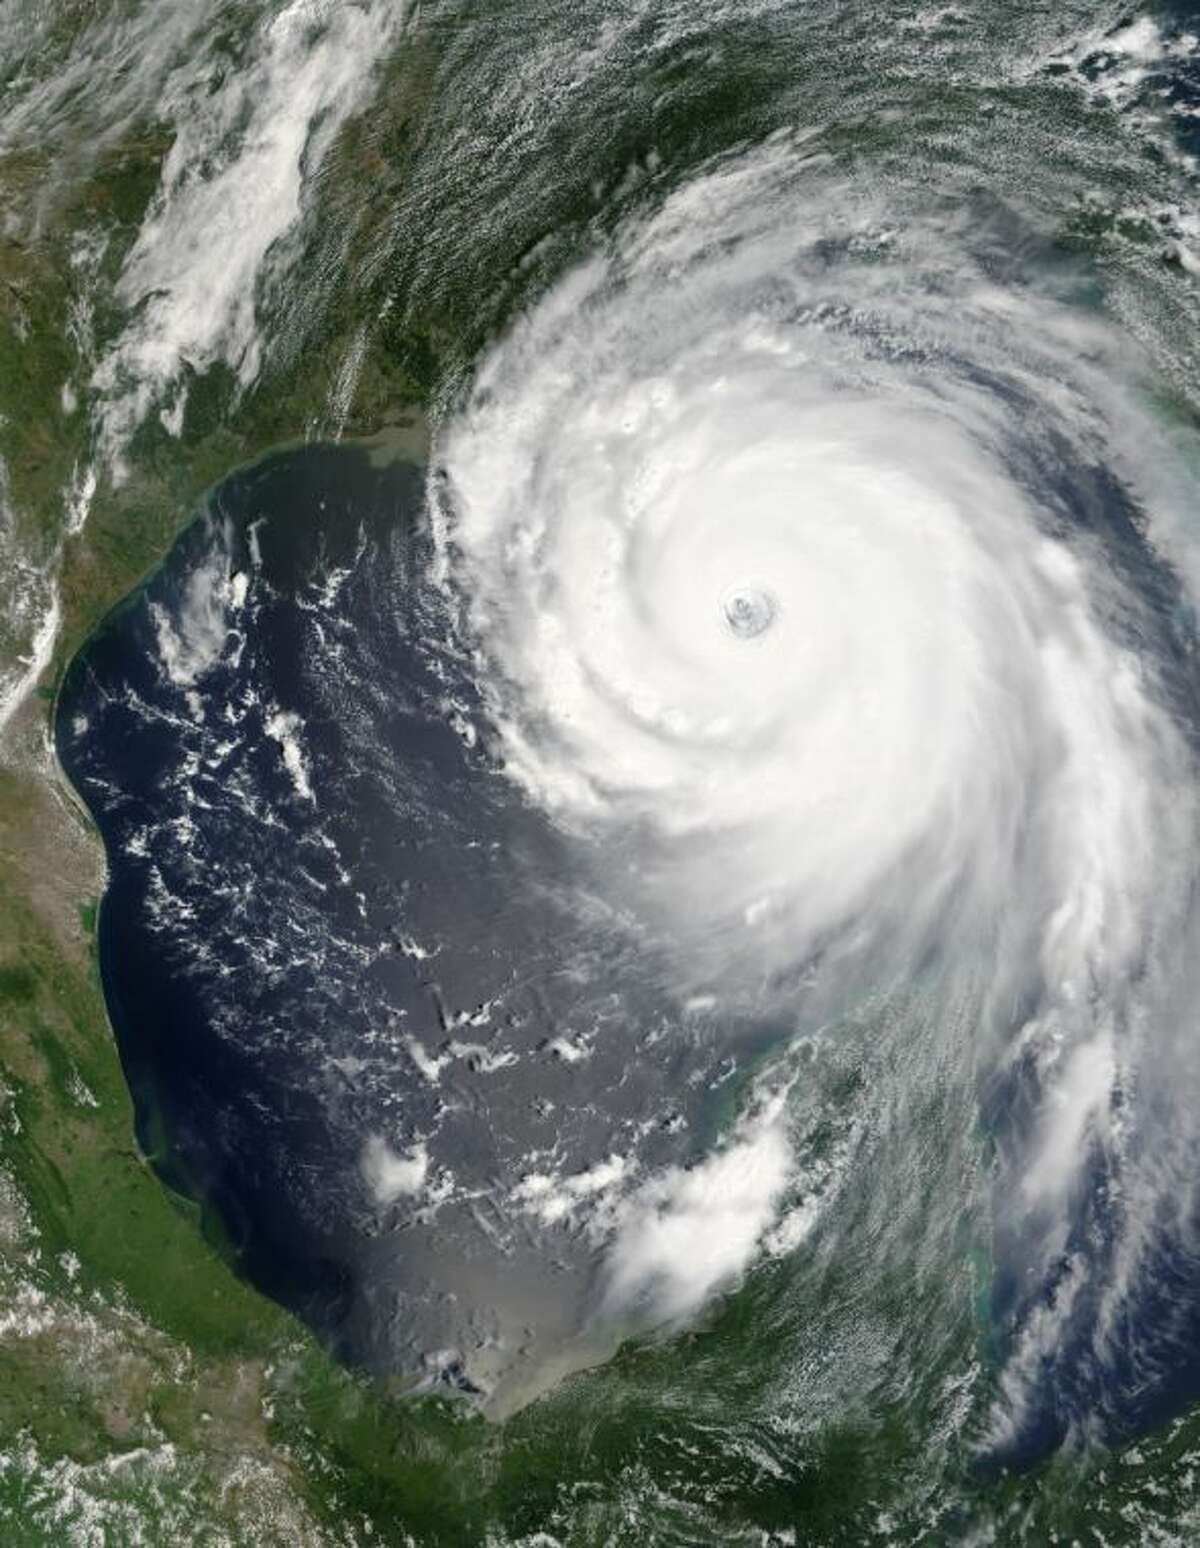 A NASA image of Hurricane Katrina on Aug. 28, 2005.